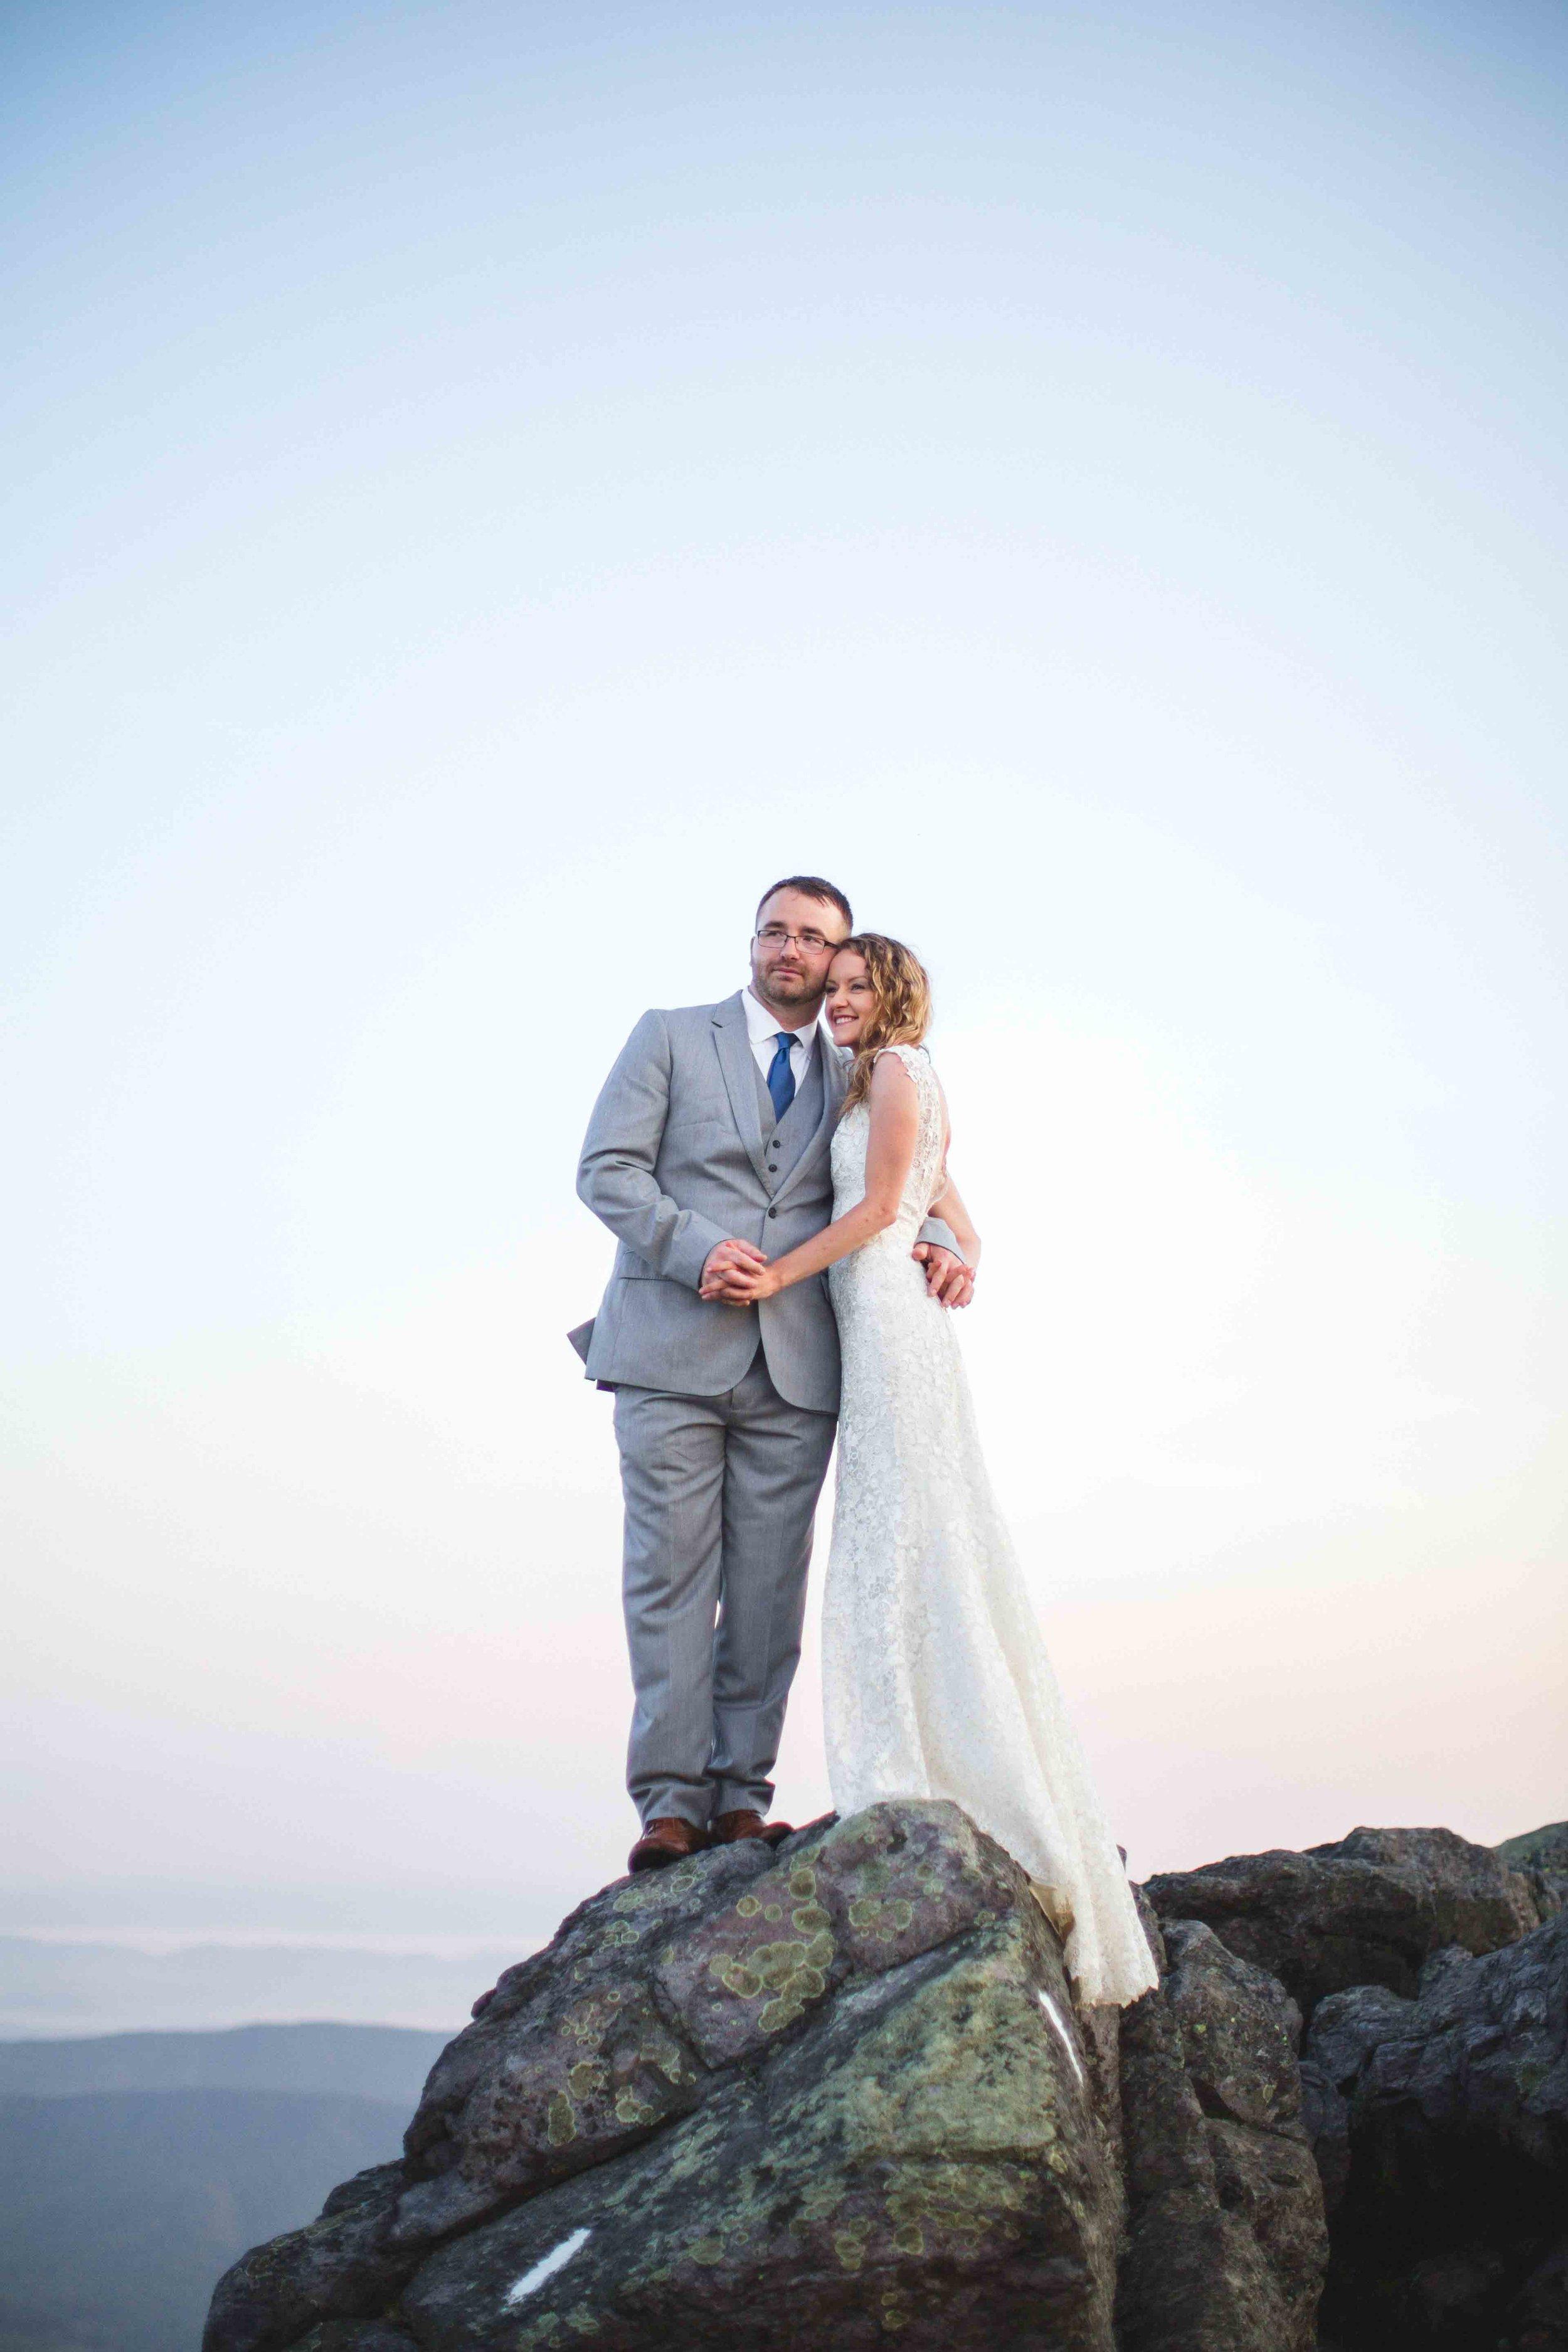 north-carolina-elopement-photographer-48.jpg